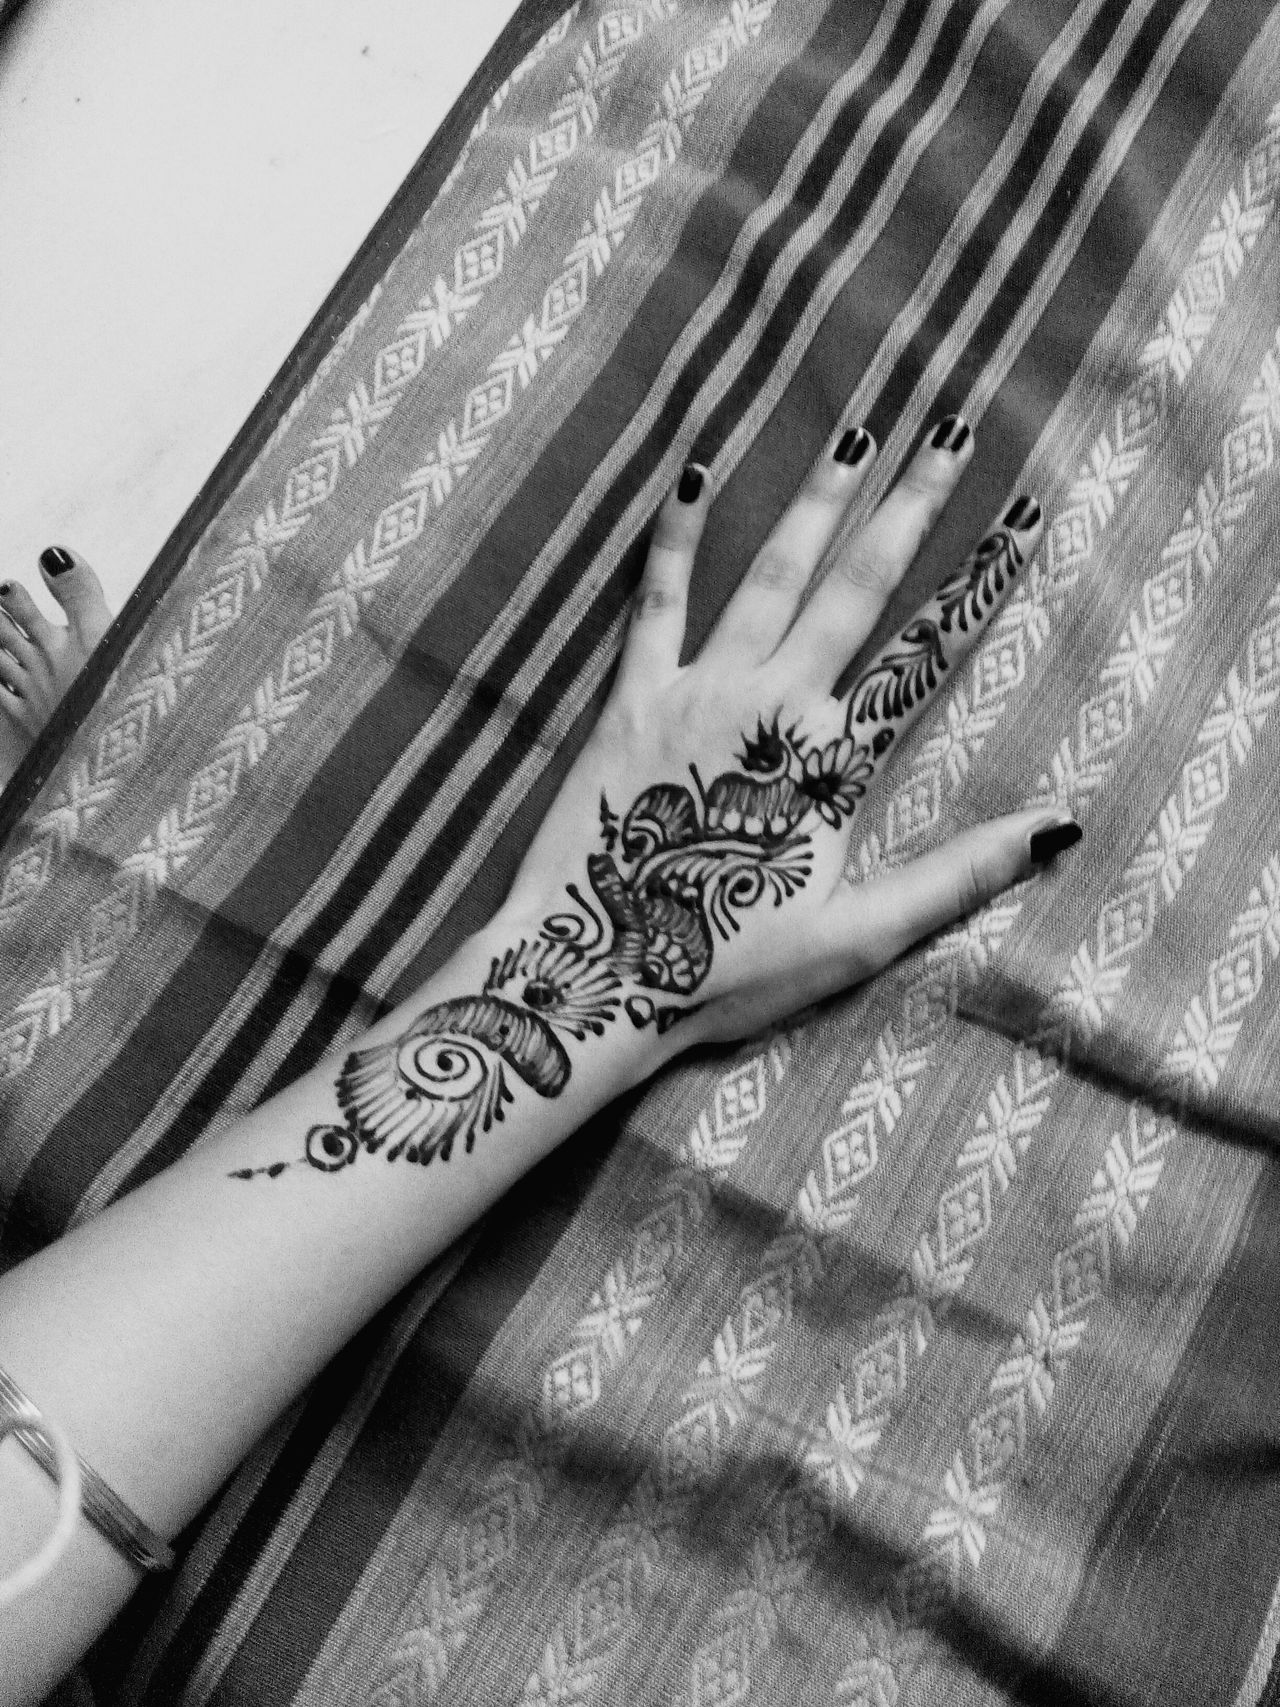 Blackandwhite Mehendi Art Henna Tattoo Indian Indian Culture  Showcase March Cultural Heritage